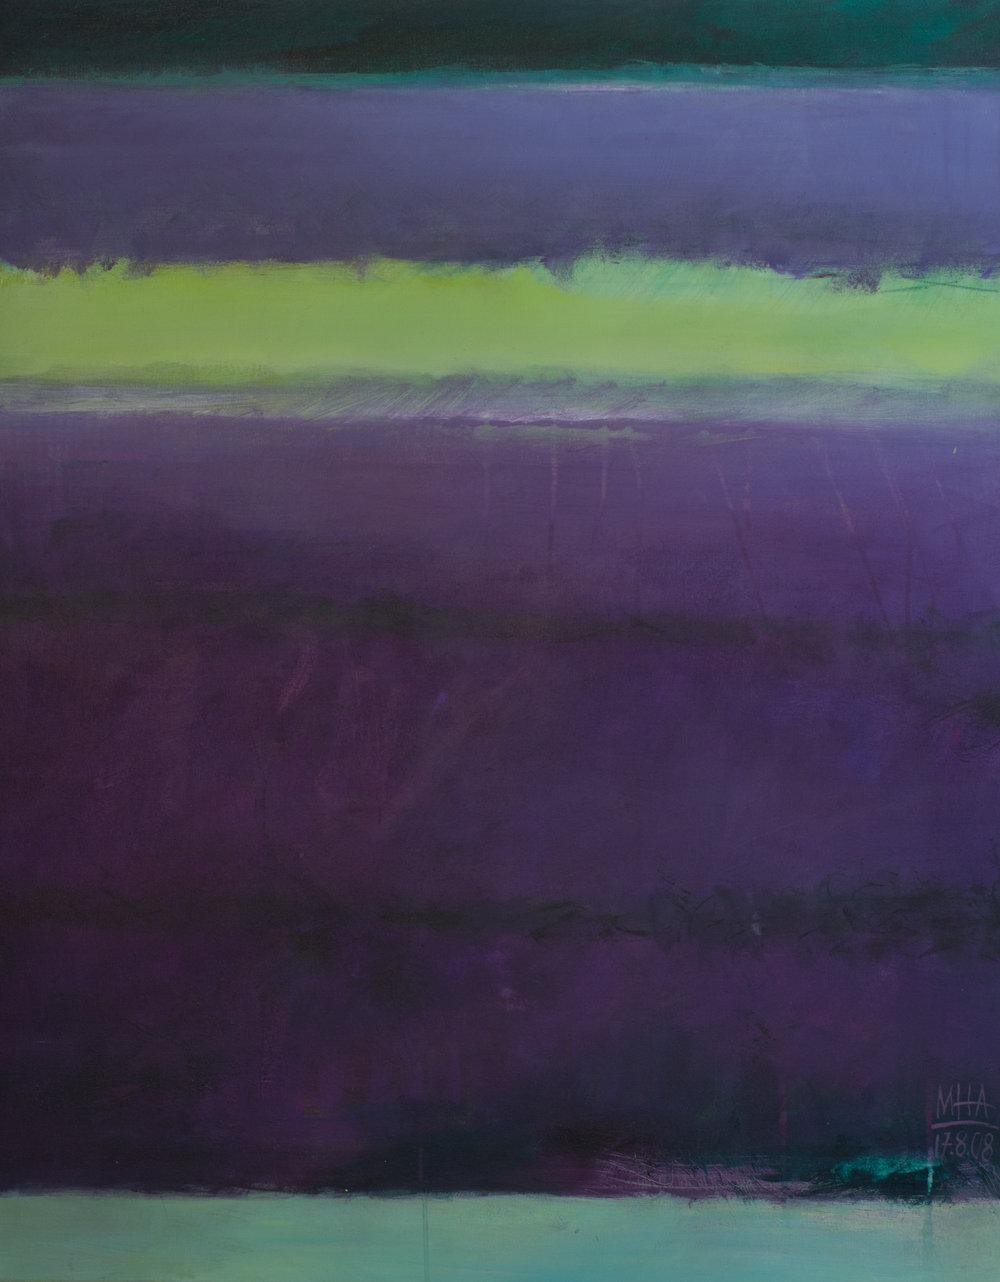 Farben der Provence , 2008,Acryl auf Leinwand, 80x100 cm